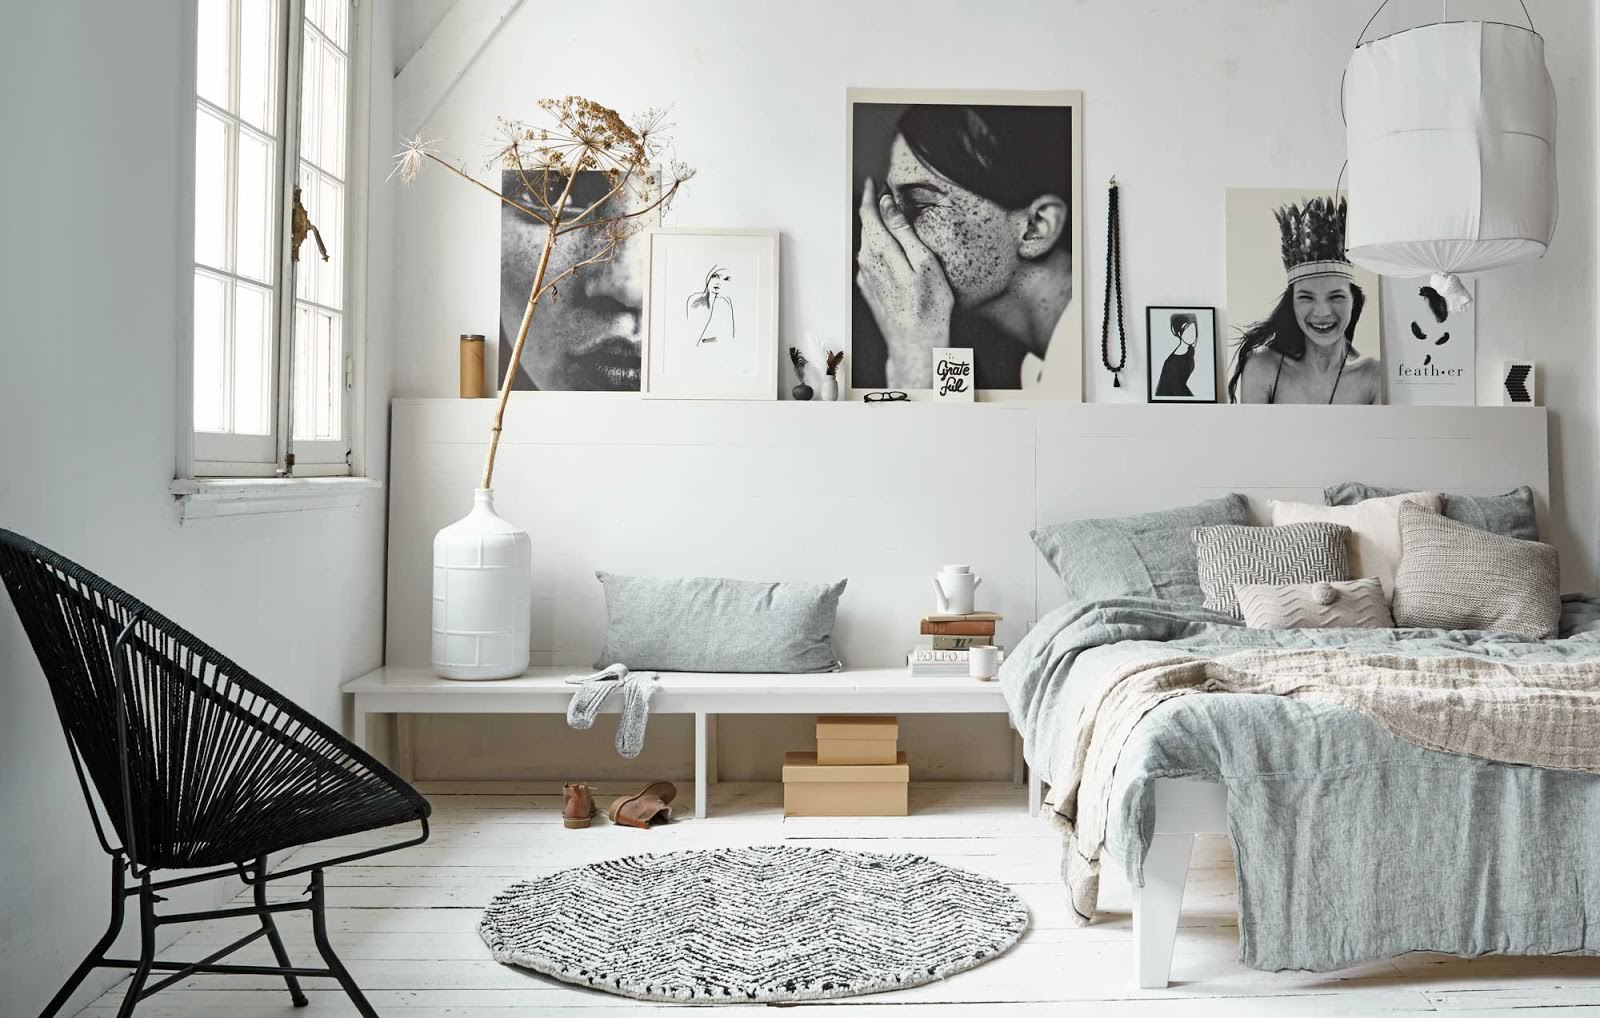 На фото декор спальни в виде постеров и ваз белого цвета